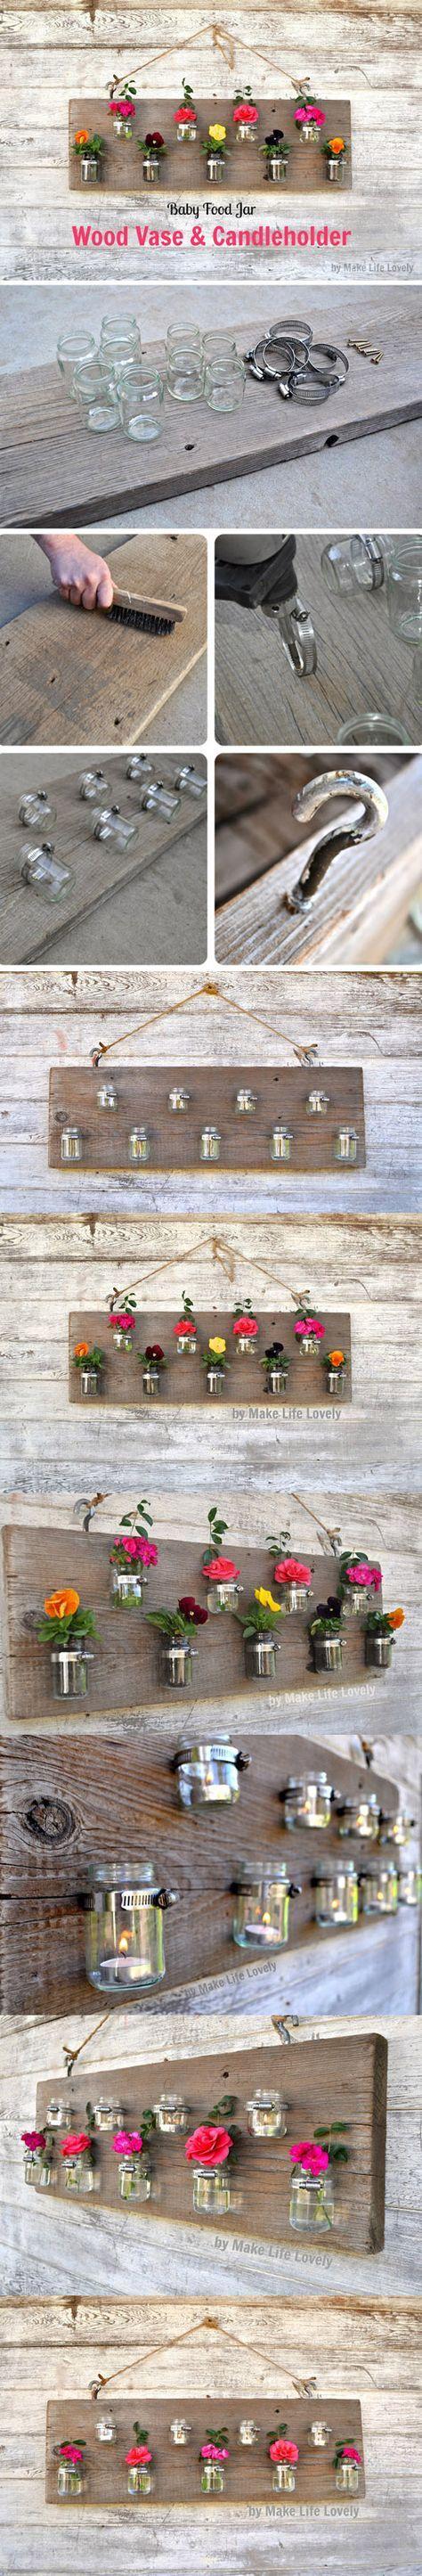 Jarrones colgantes con tarros de vidrio jardin tarros for Jarrones de vidrio decorados